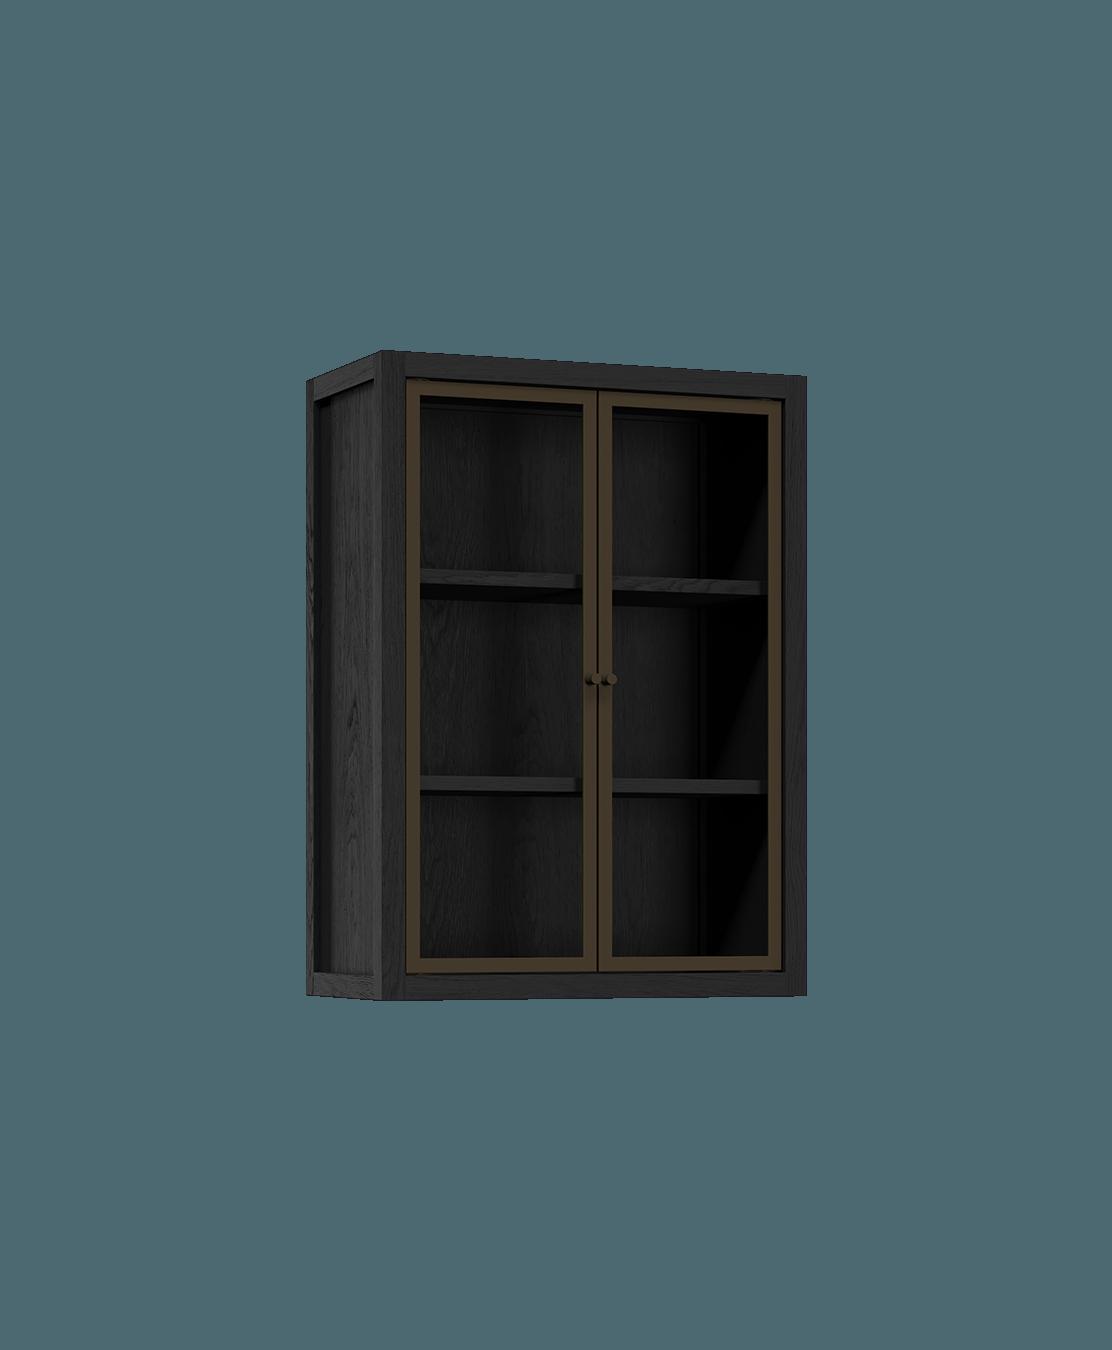 coquo radix midnight black stained oak solid wood modular 2 glass doors wall upper kitchen cabinet 12 inch C1-W-2412-0201-BK